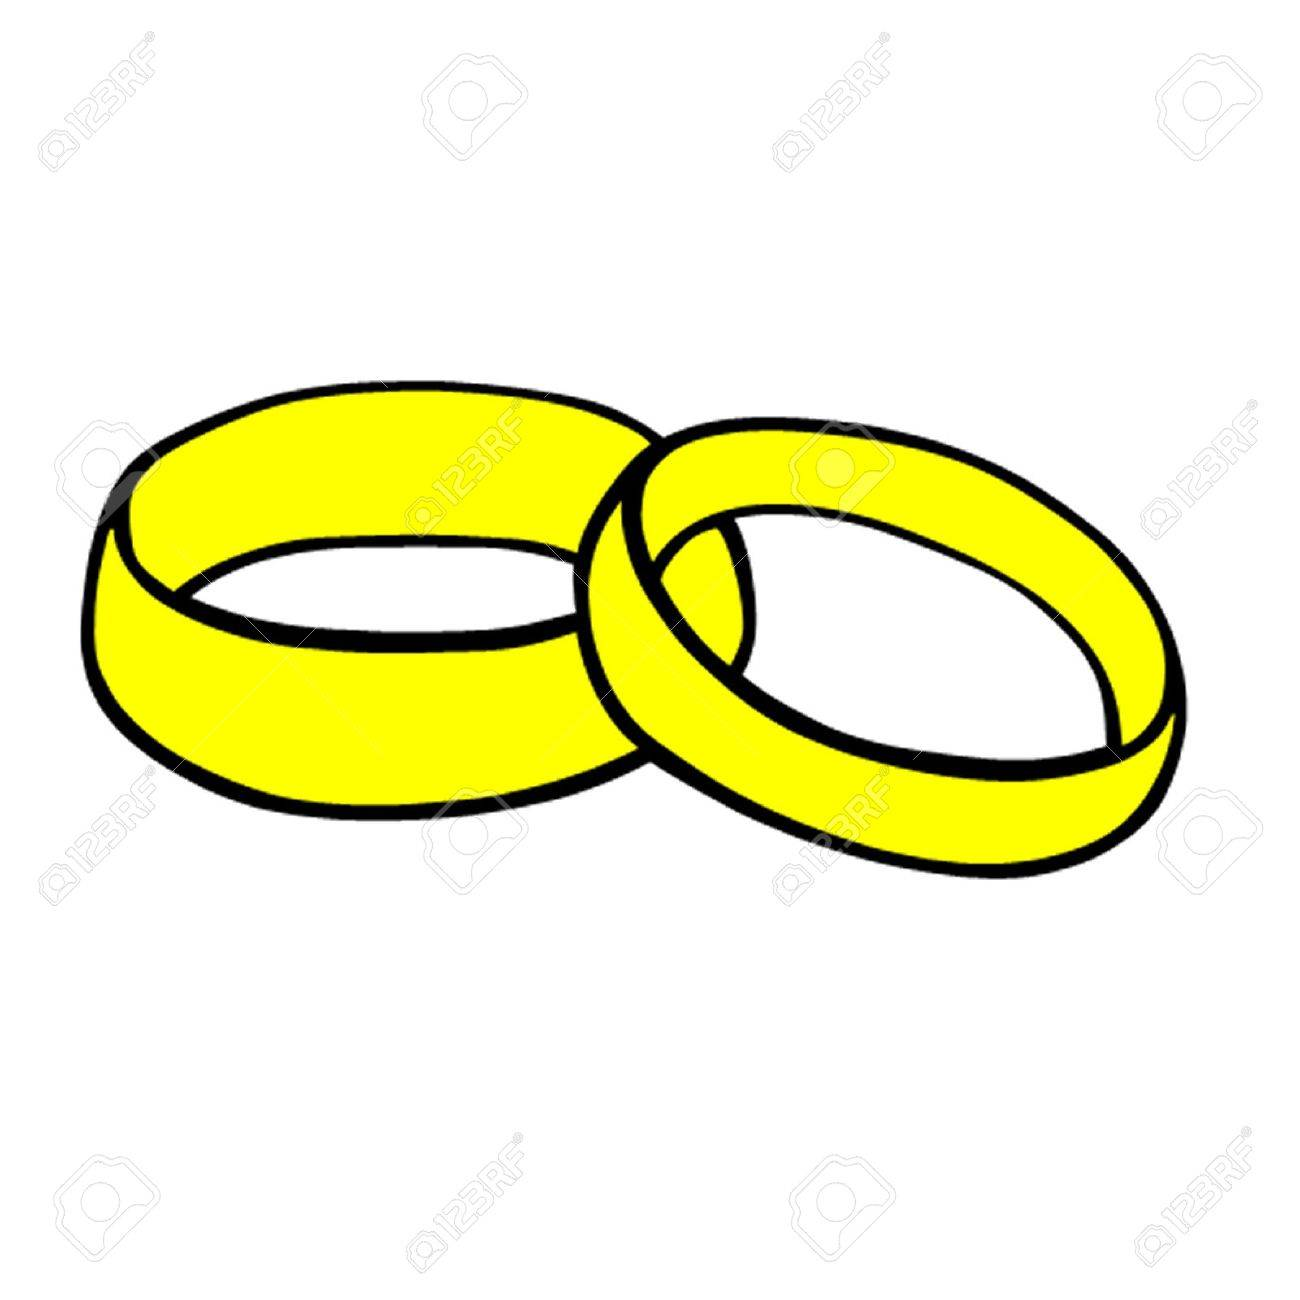 Wedding Rings Stock Vector - 12475174